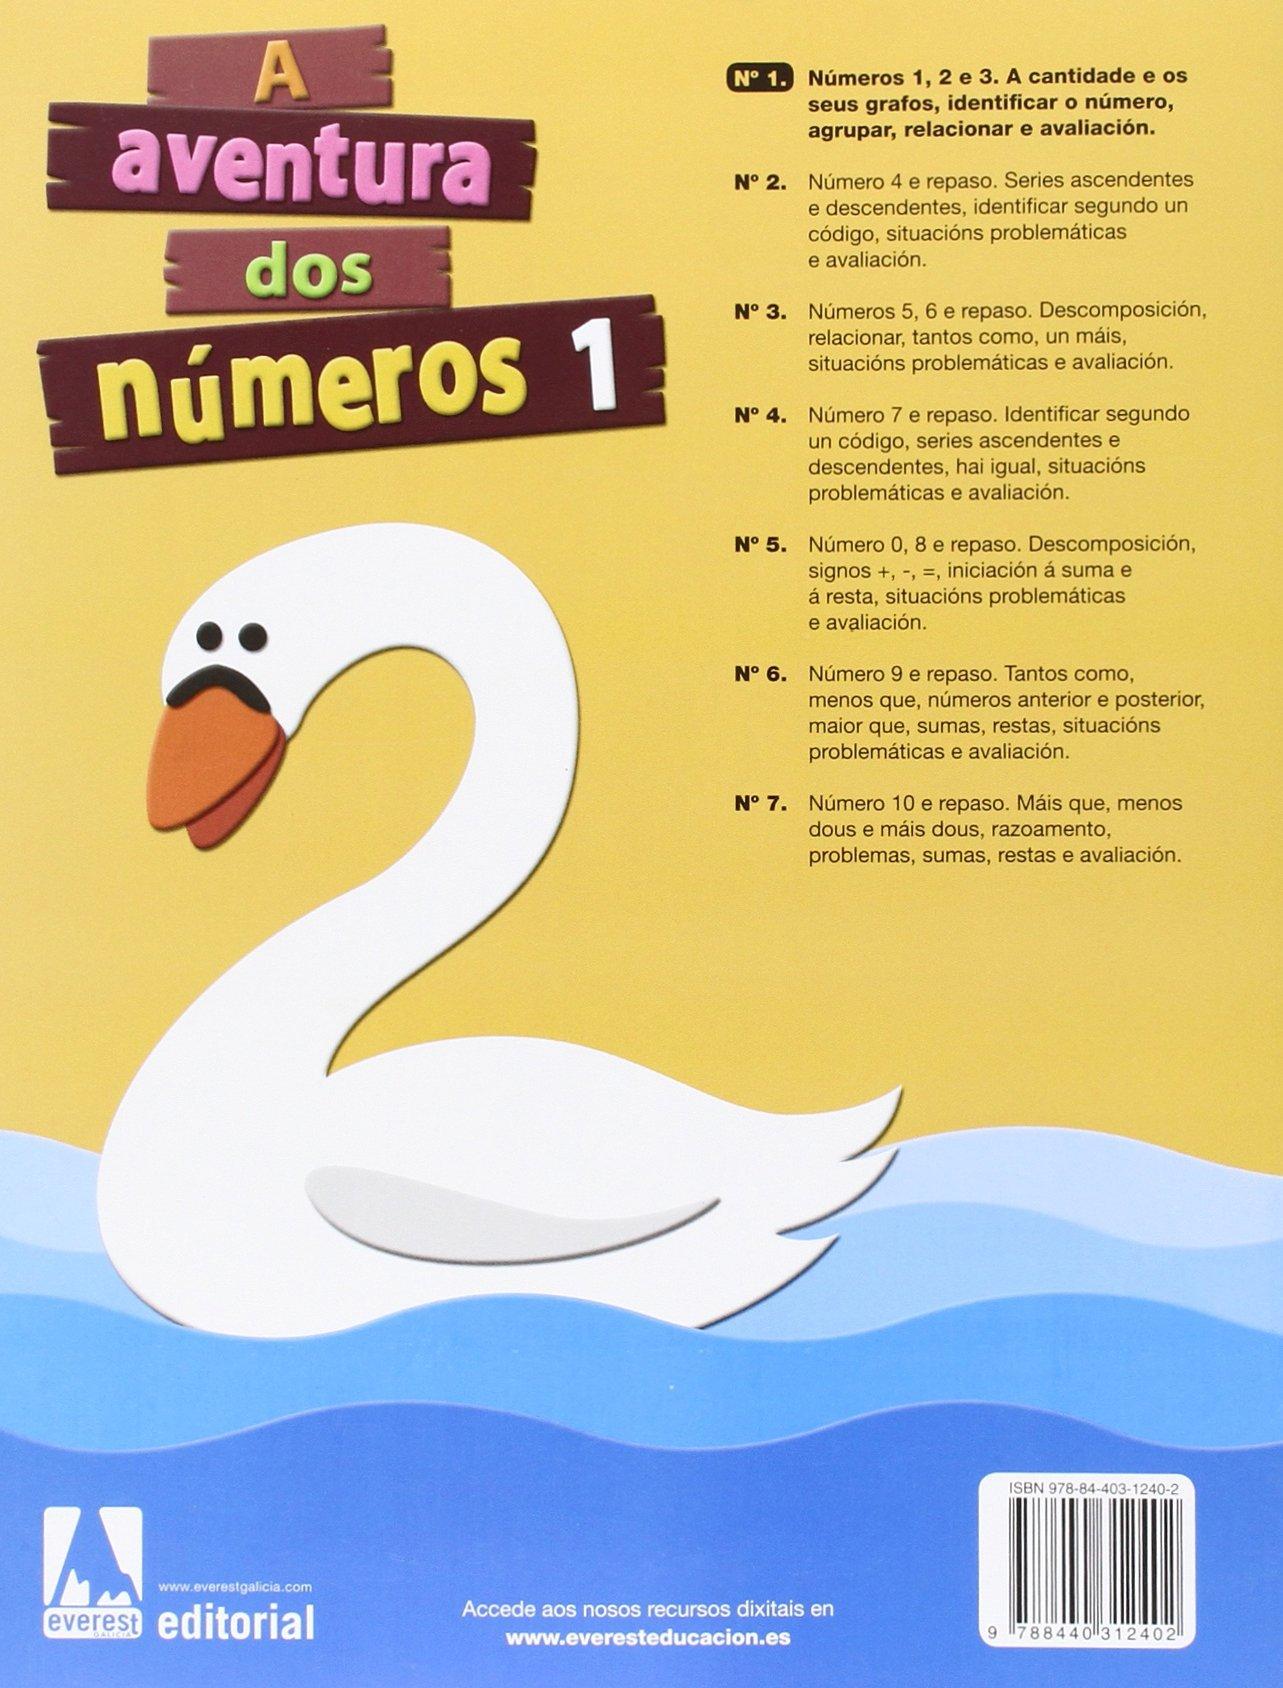 A aventura dos números 1 - 9788440312402: Amazon.es: Díez Torío Ana María,  Estébanez Estébanez Aurora, Calvo Rojo María del Carmen, Anievas Alfredo,  ...